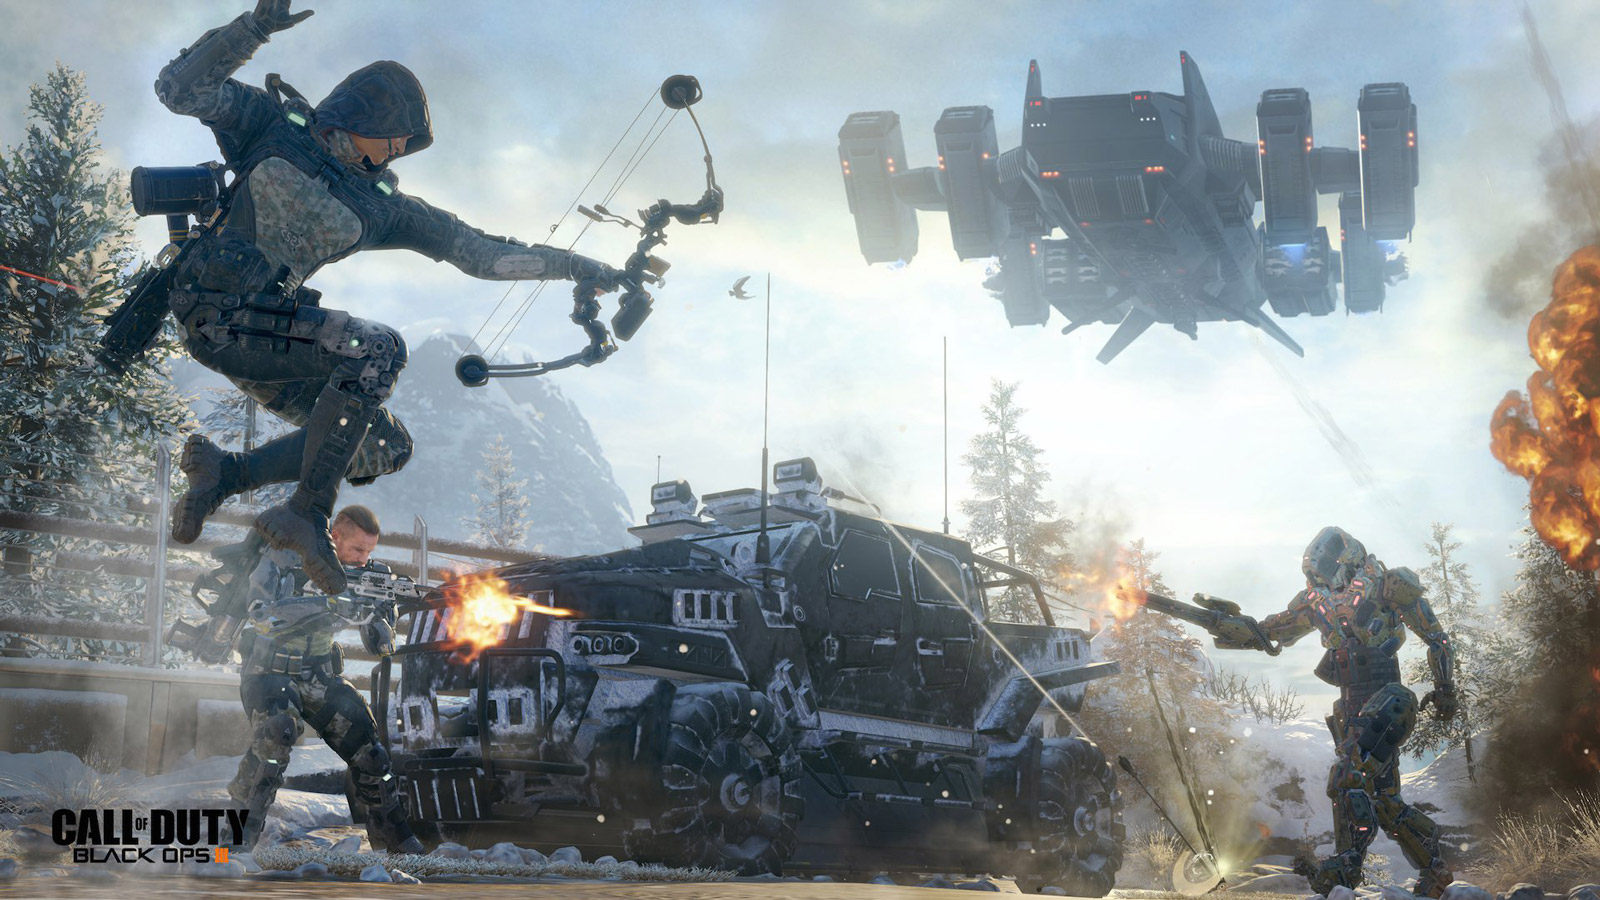 Free Call of Duty: Black Ops III Wallpaper in 1600x900